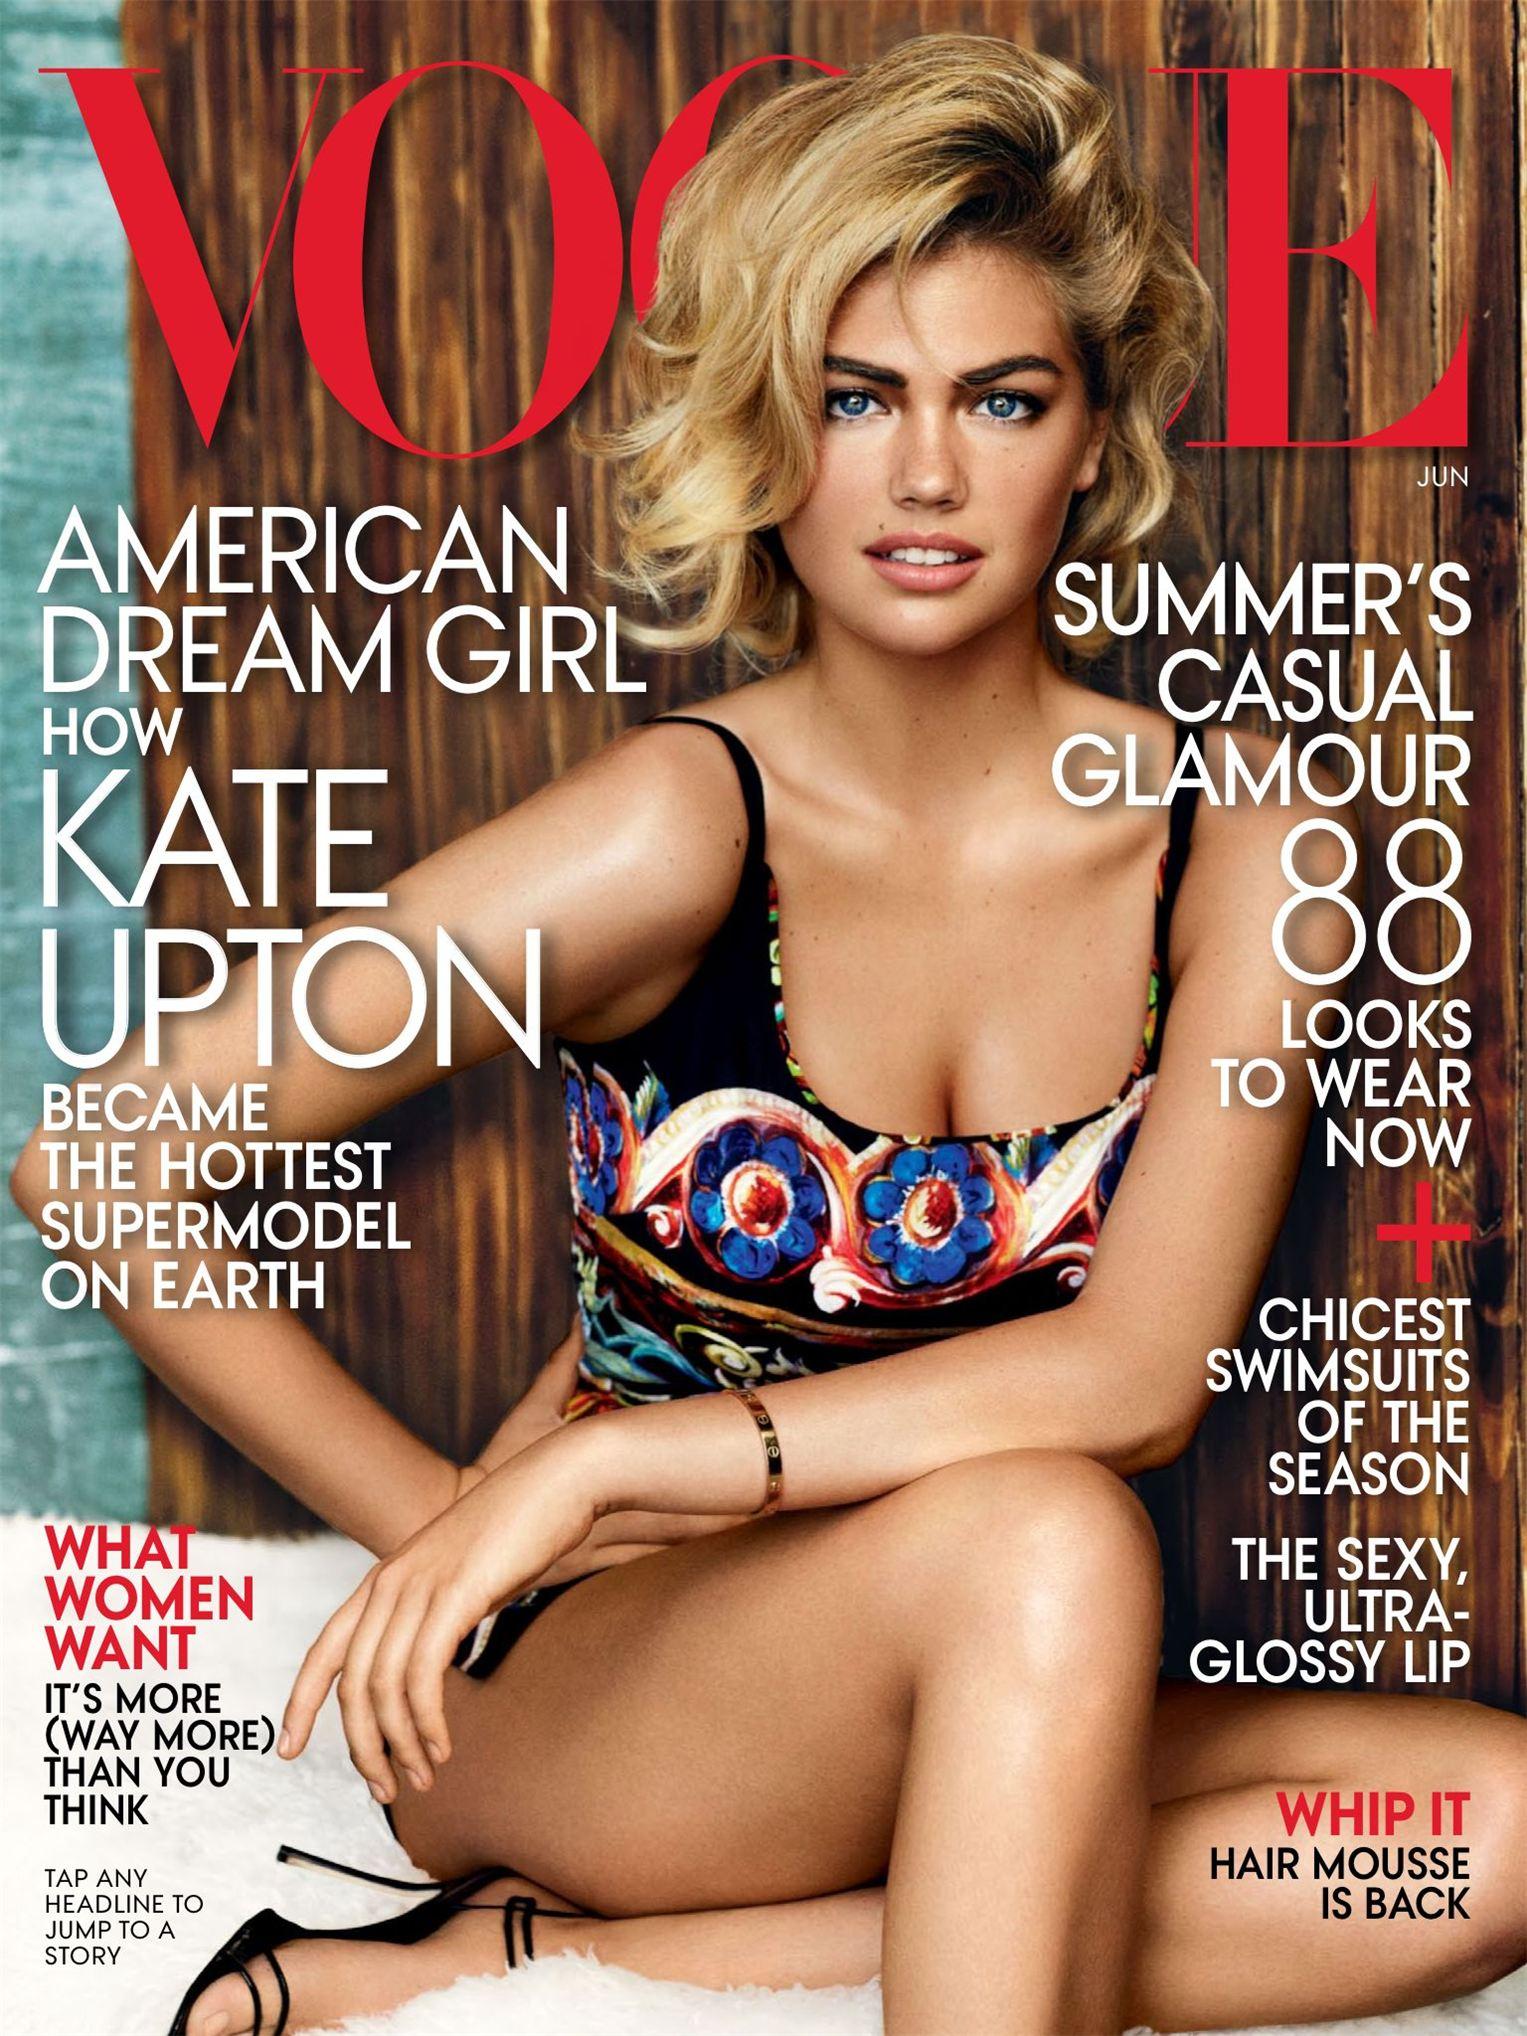 Kate Upton / Кейт Аптон - самая горячая супермодель мира на обложке журнала Vogue US, июнь 2013 / фотограф Mario Testino